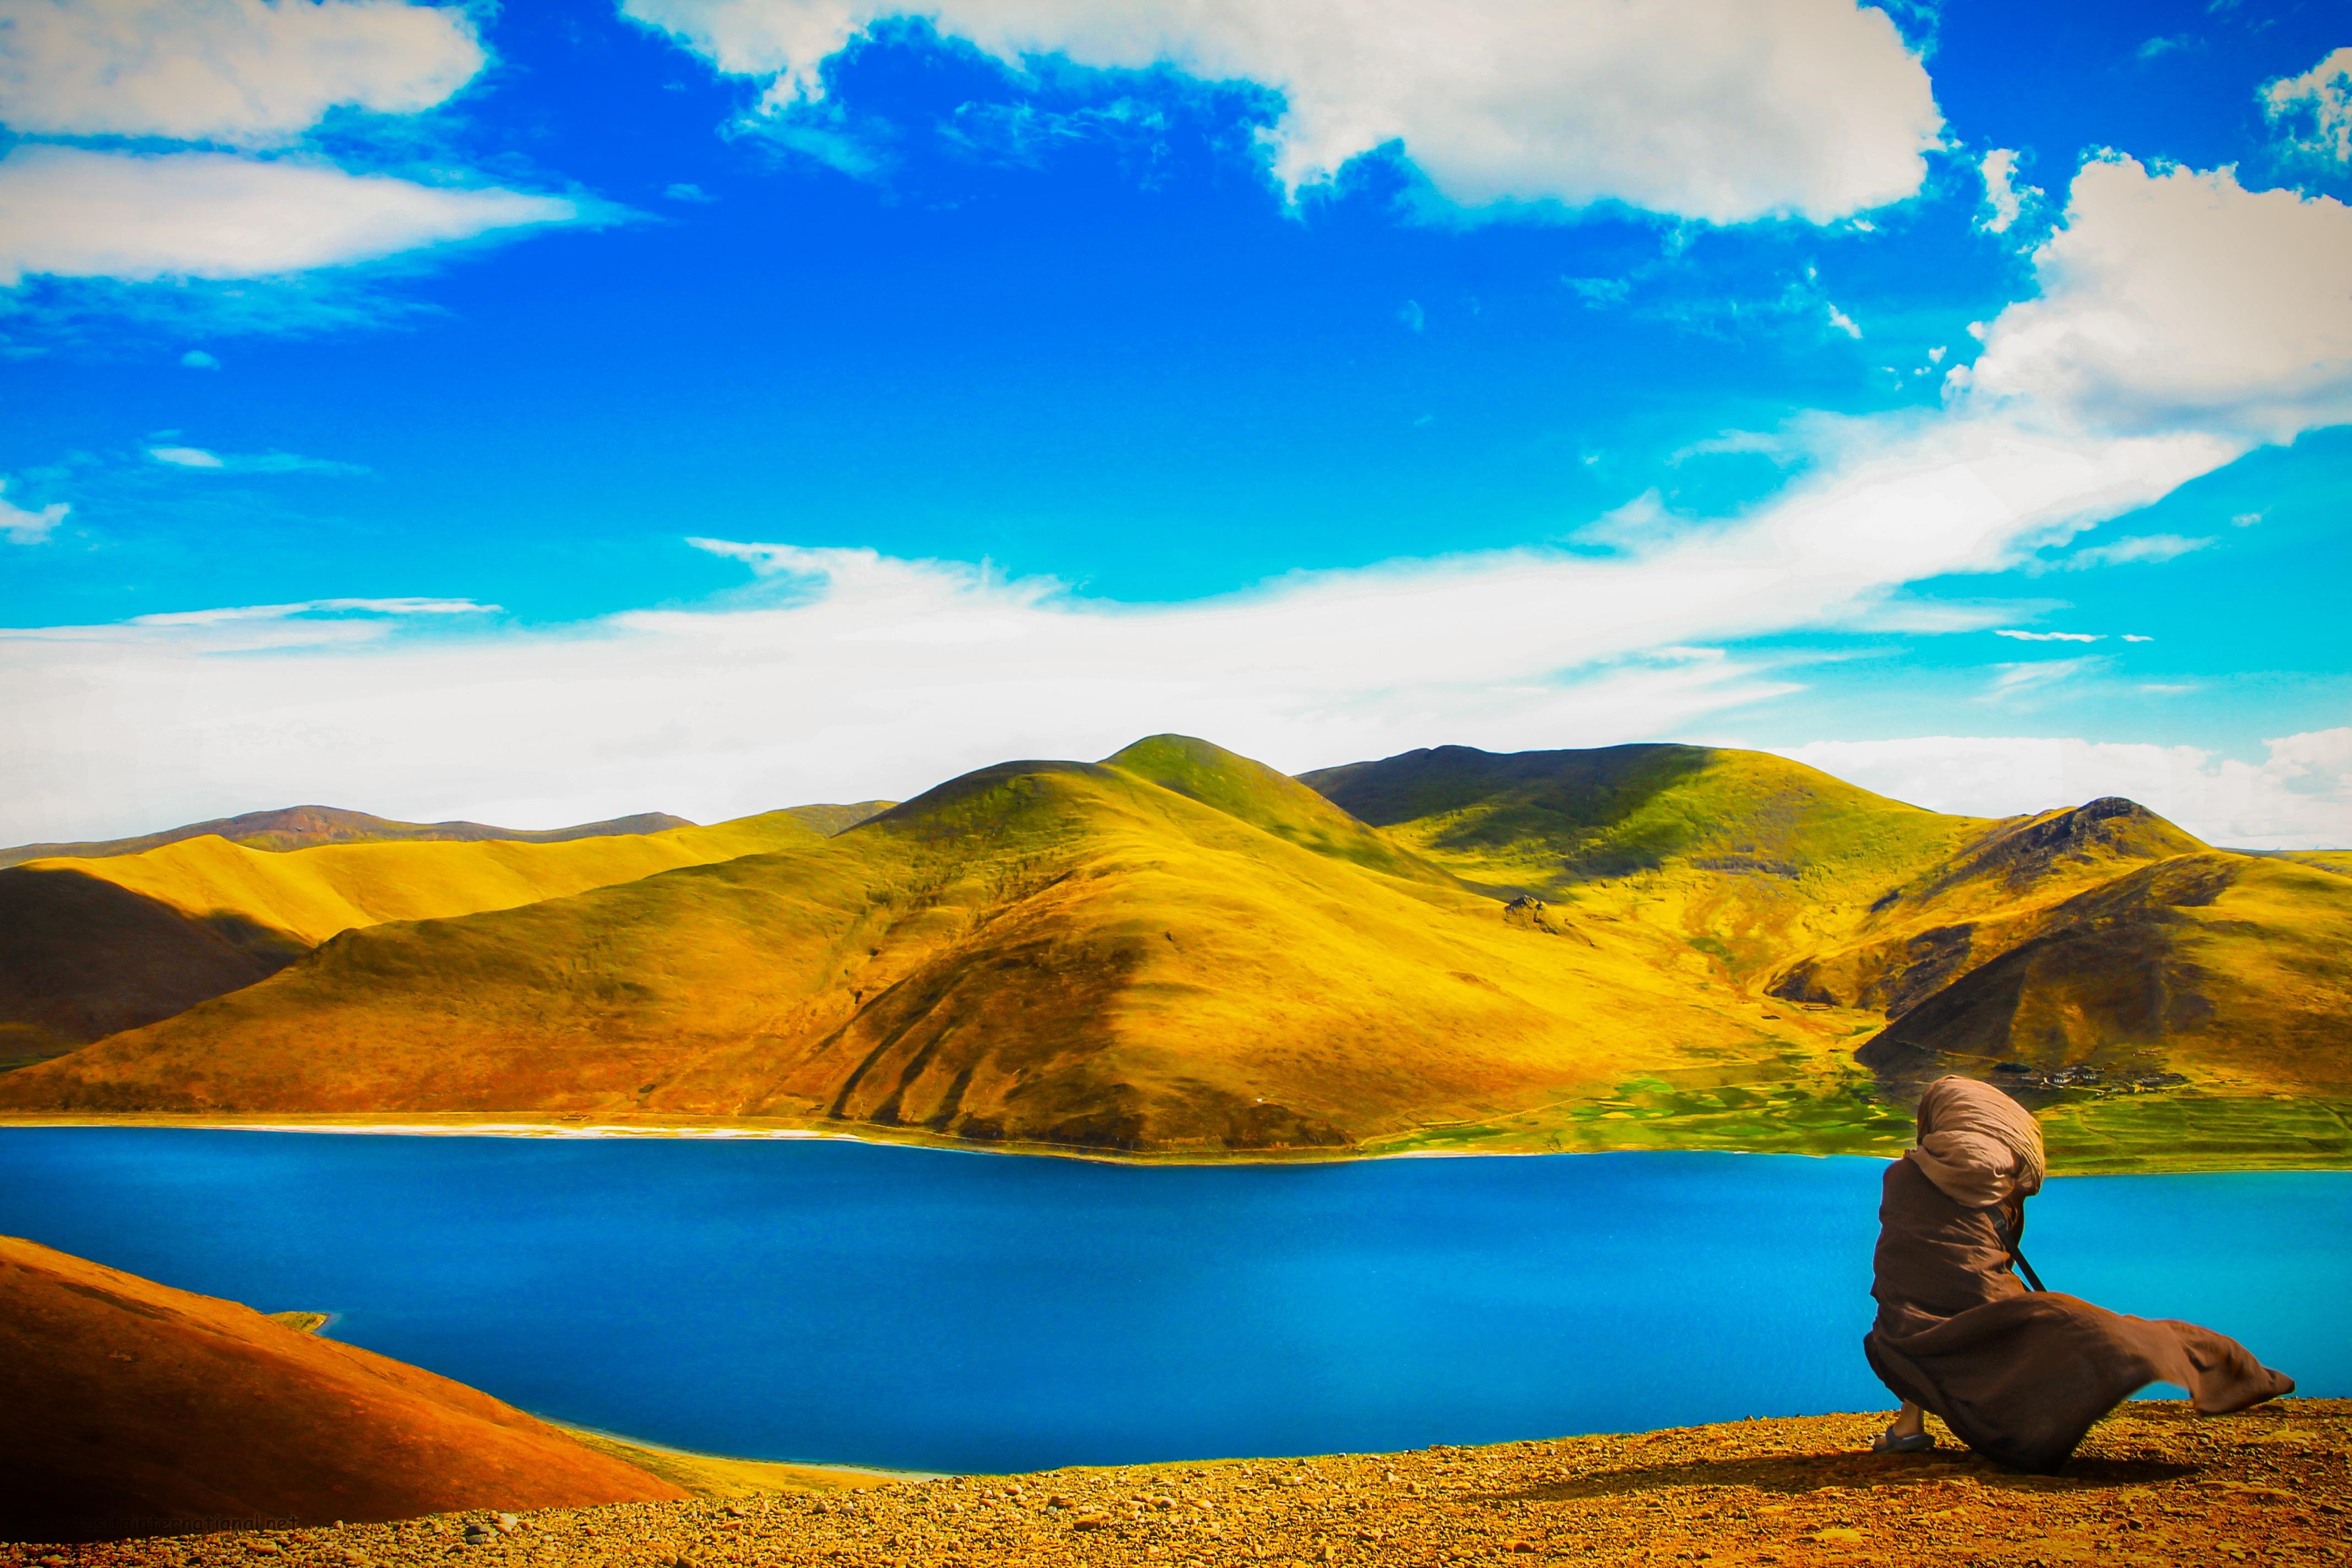 Background image 100 responsive - Background Image 100 Responsive 37